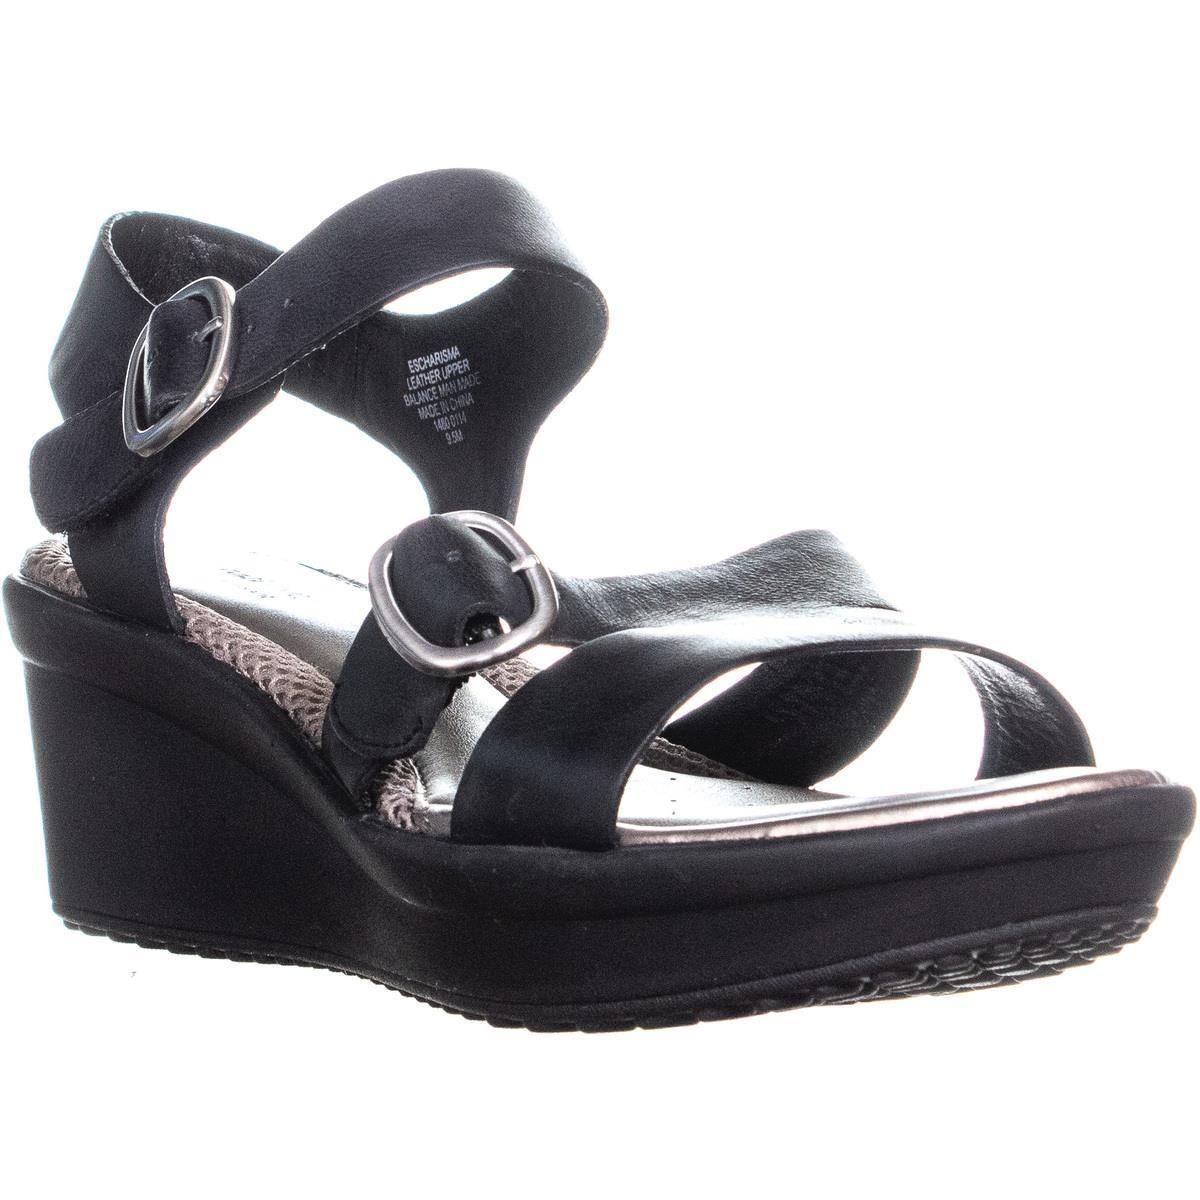 9f939c98351 Lyst - Easy Spirit Charisma Ankle Strap Comfort Wedge Sandals in Black